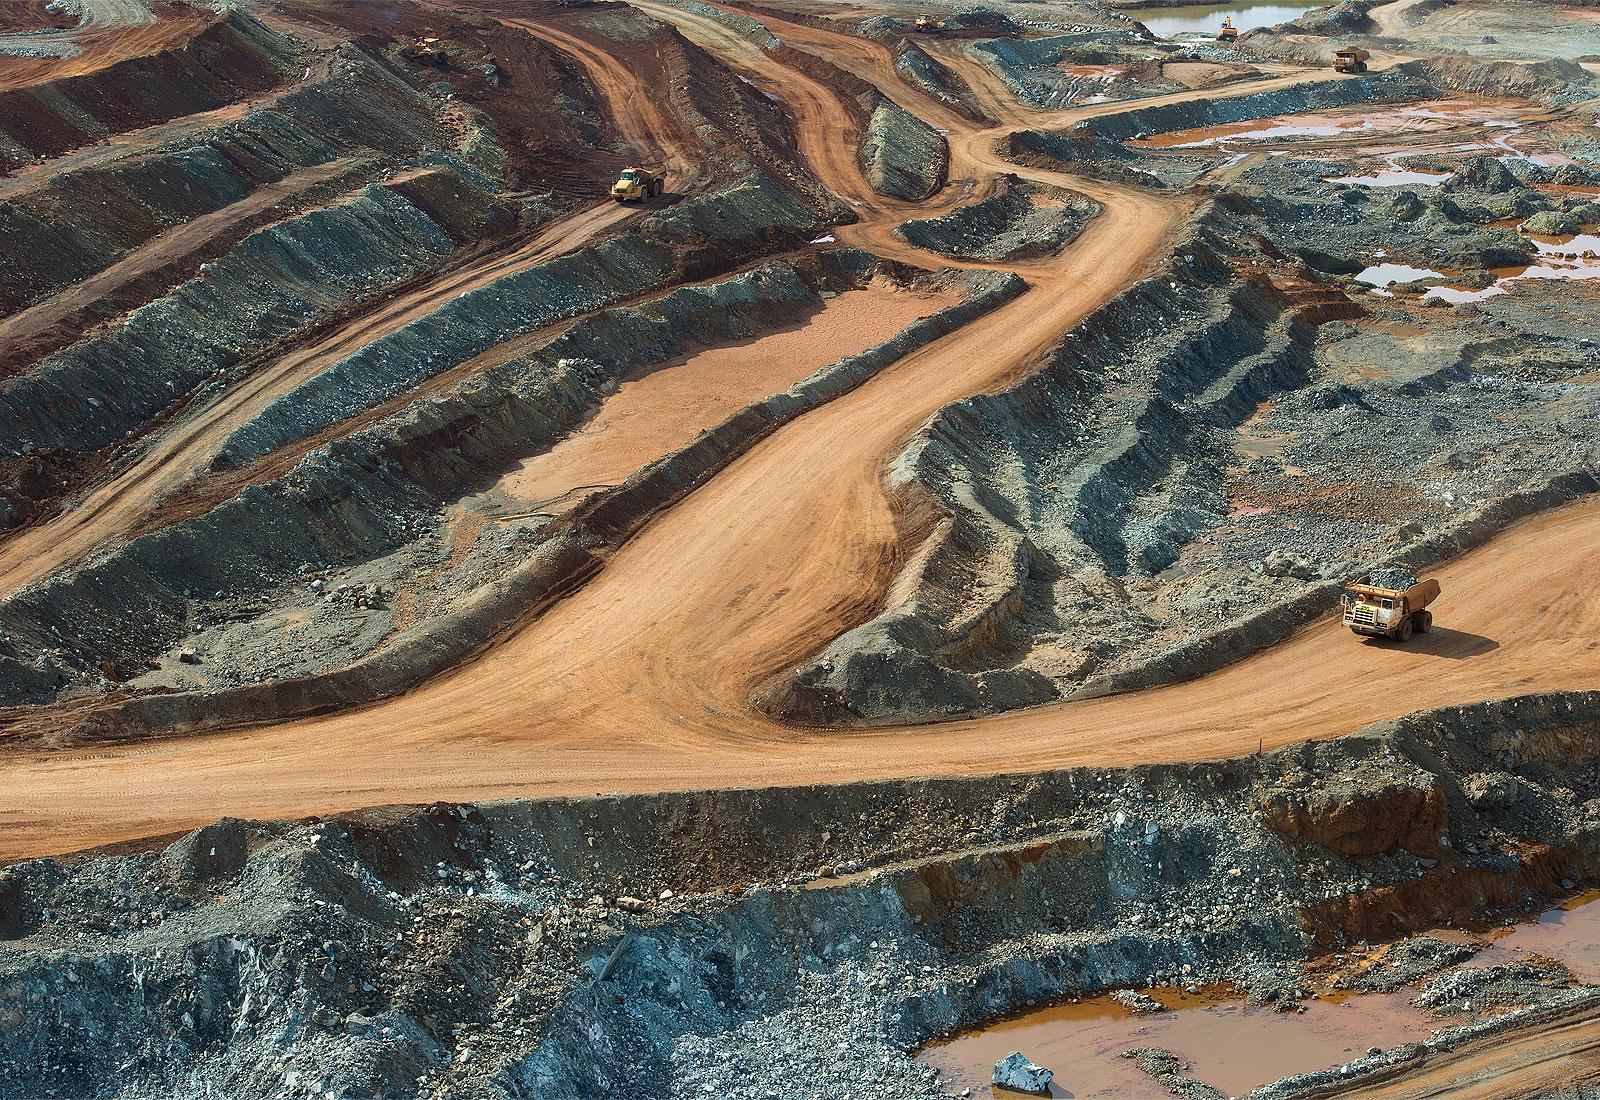 Aerial photo of a nickel mine